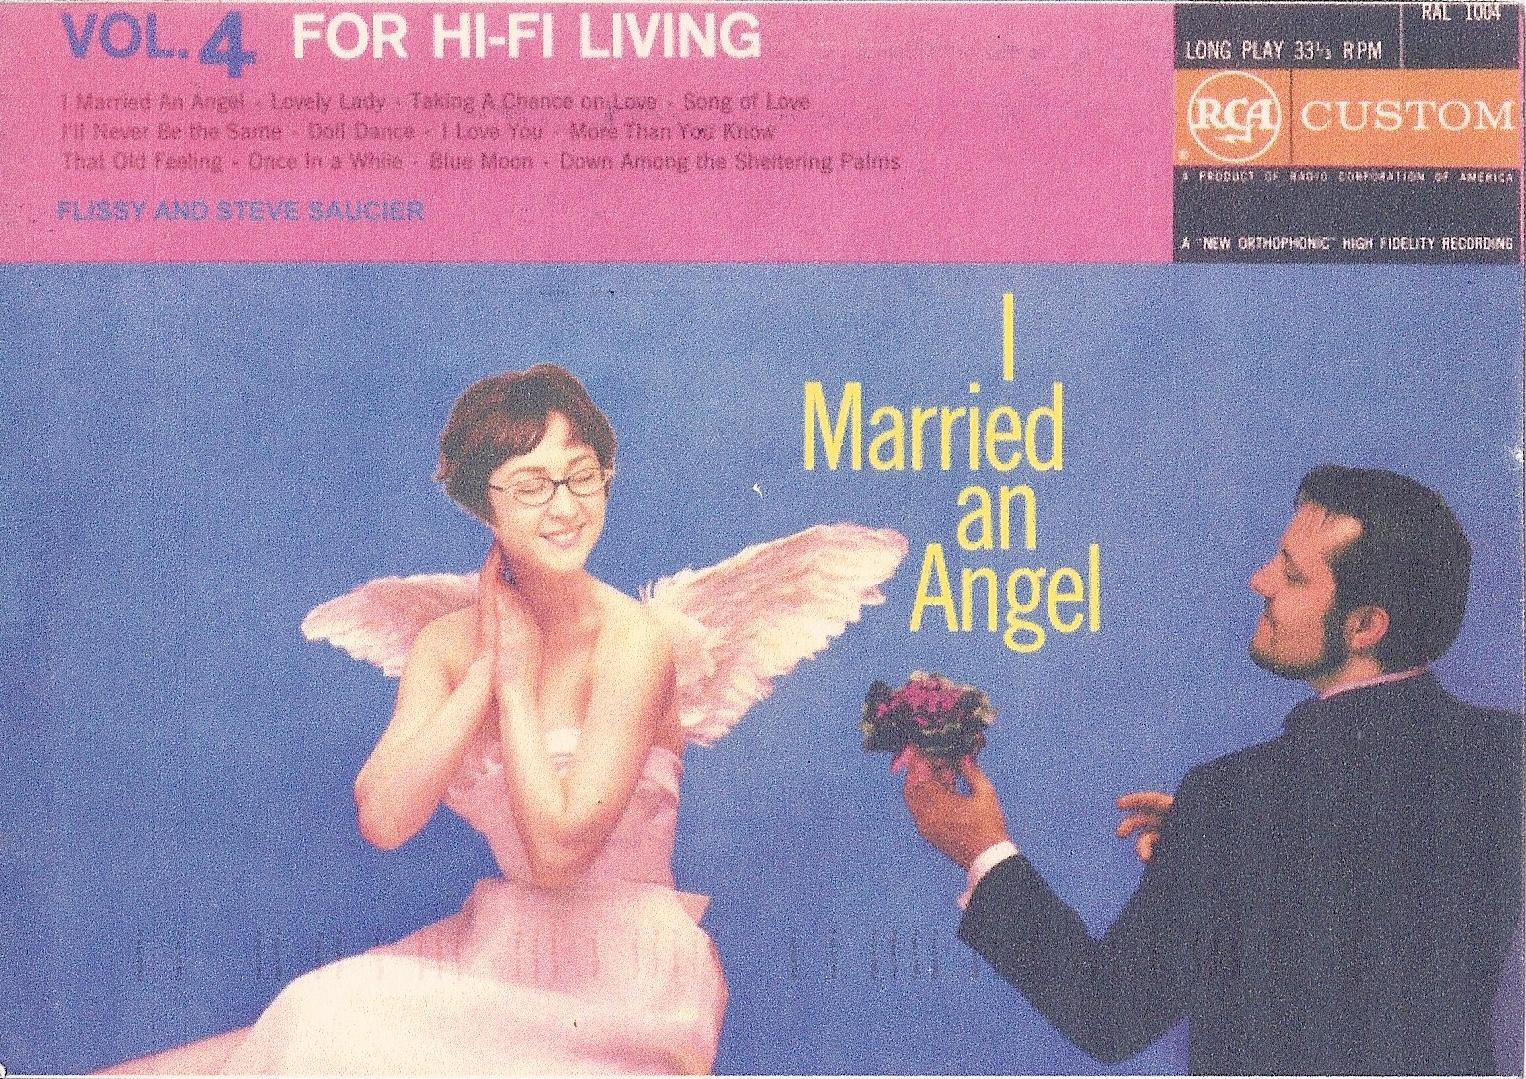 Behold, Flissy's divine Photoshop skills, circa 2004.